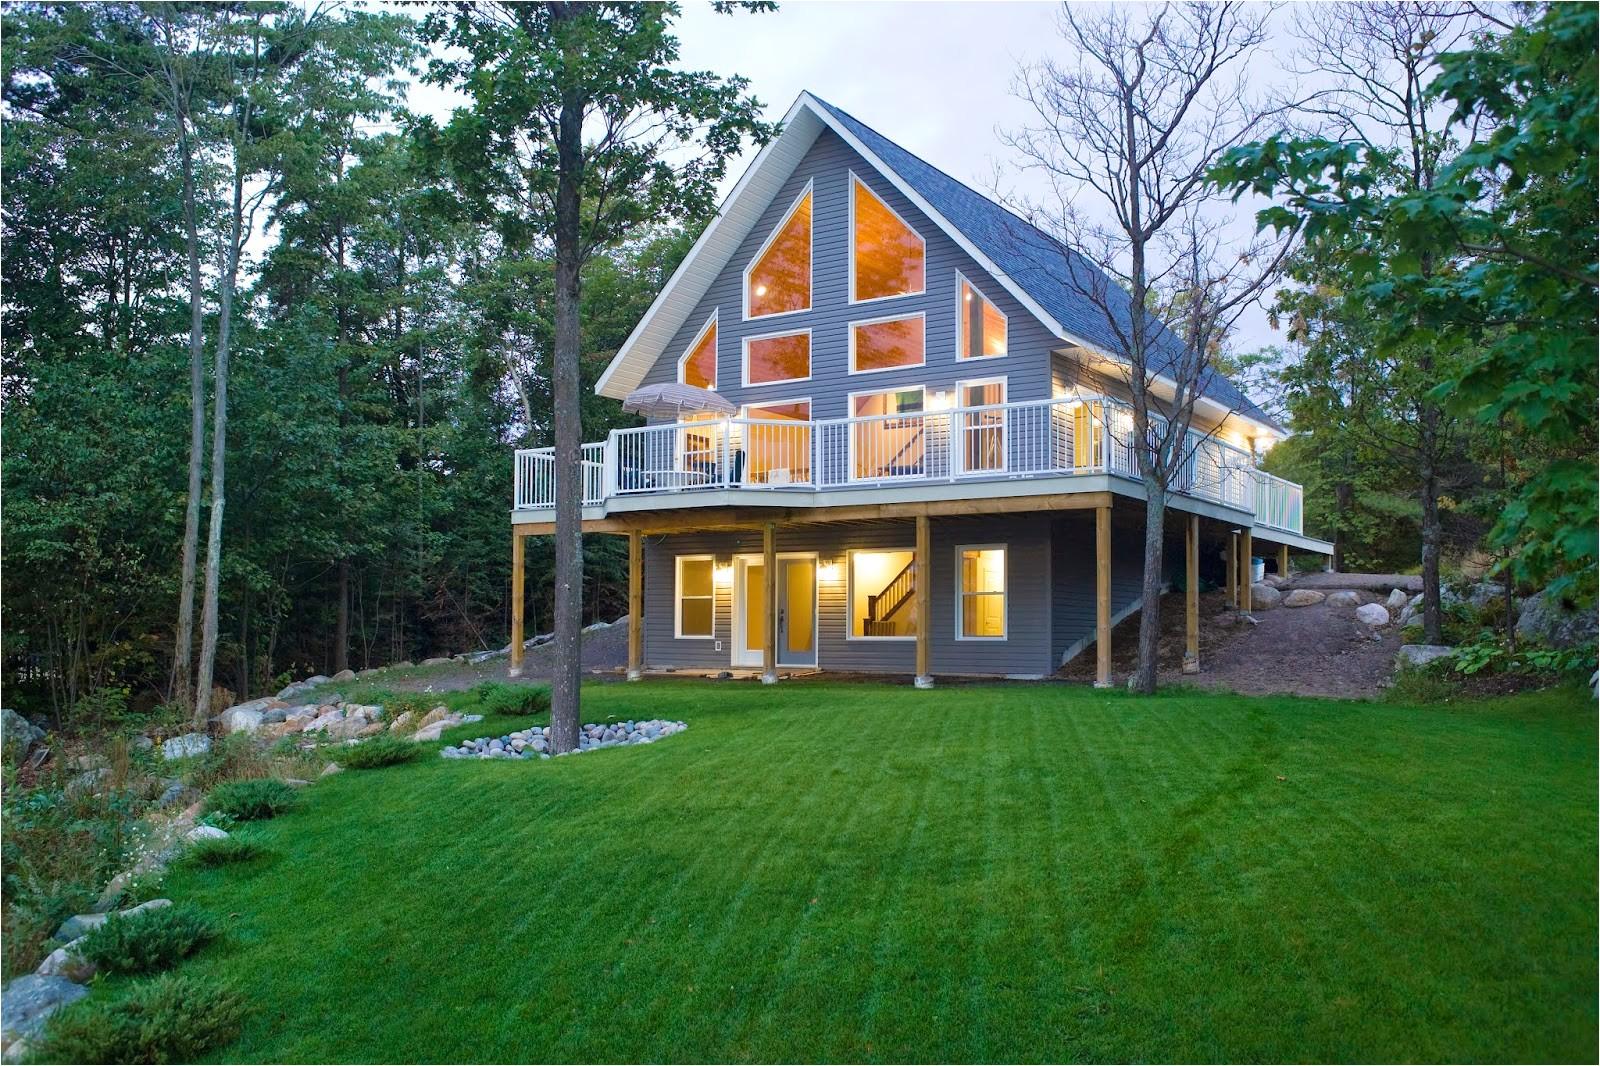 Home Hardware Cottage Plans Beaver Homes Cottages Merrett Home Hardware